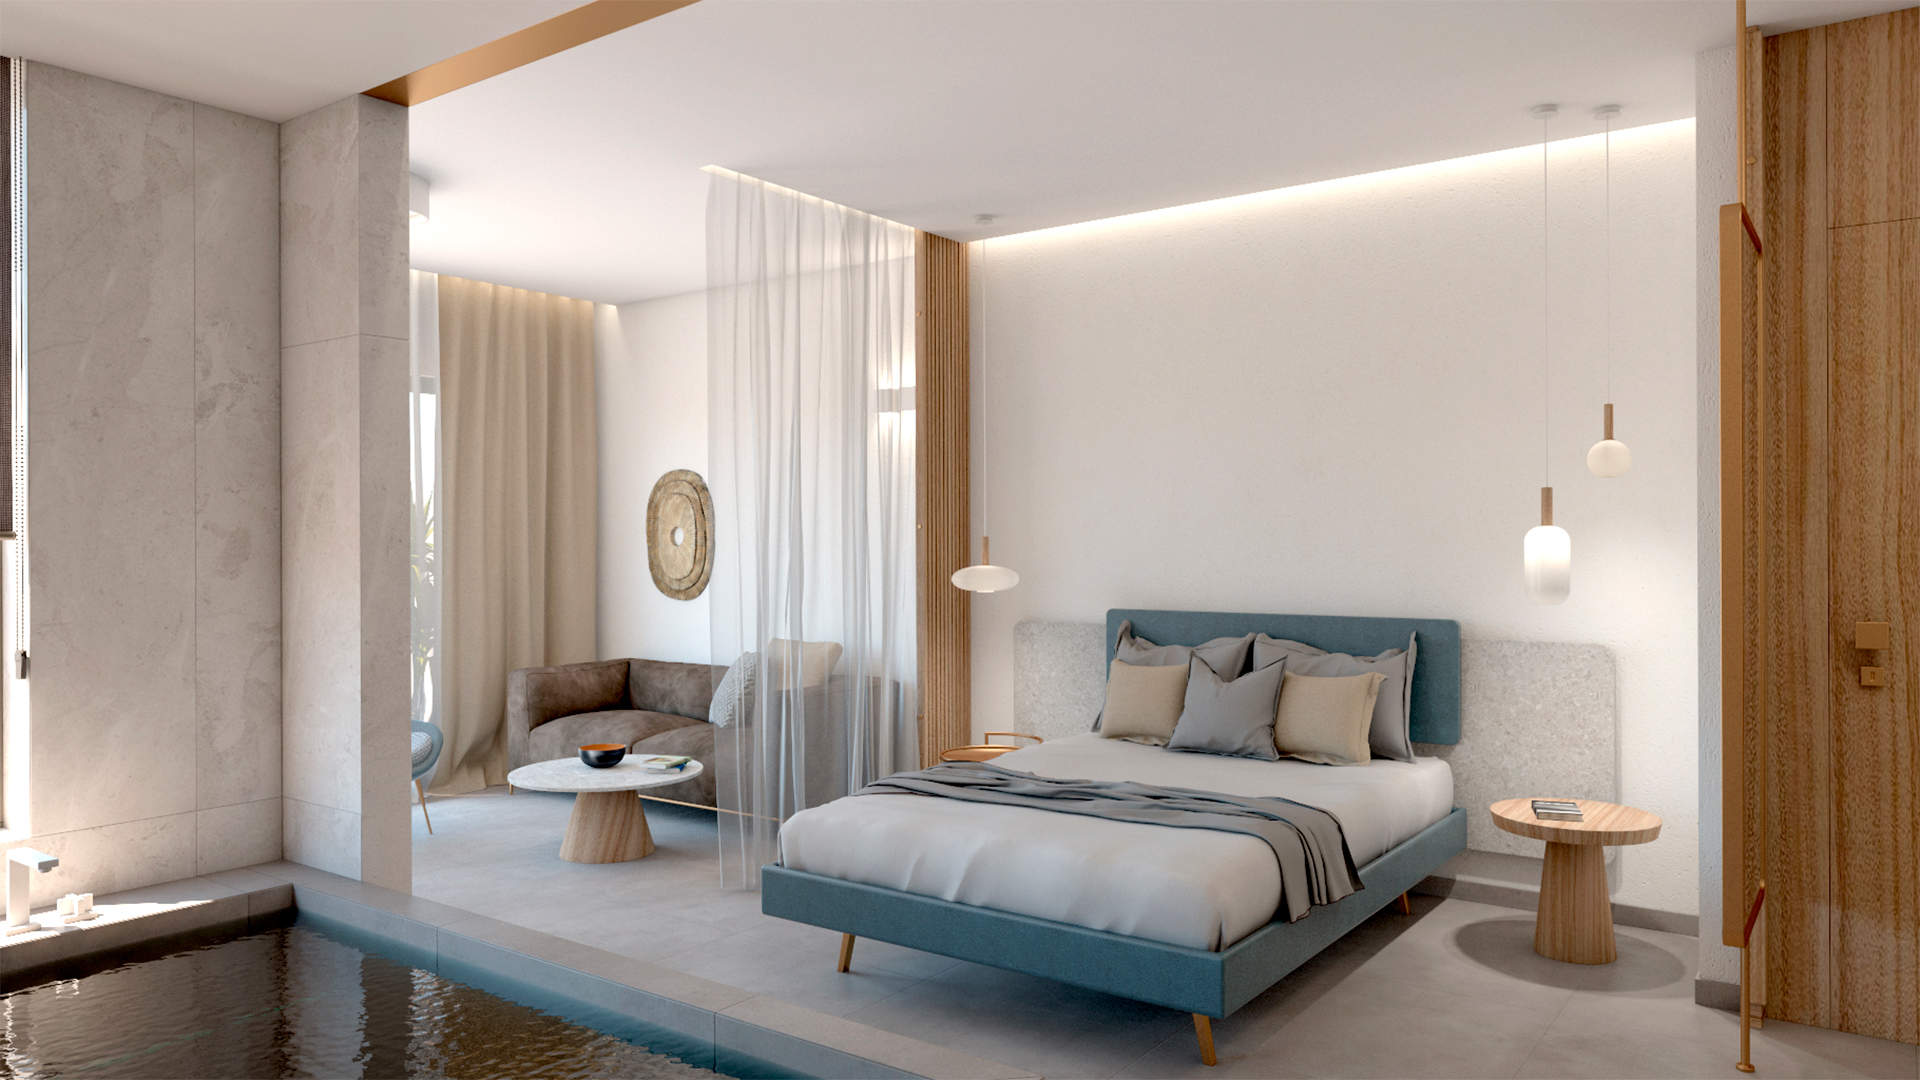 Luxury suite, interior design, indoor Jacuzzi, bed, living room. Πολυτελής σουίτα, σχεδιασμός και διακόσμηση, εσωτερικό τζακούζι, κρεβατοκάμαρα, καθιστικό.